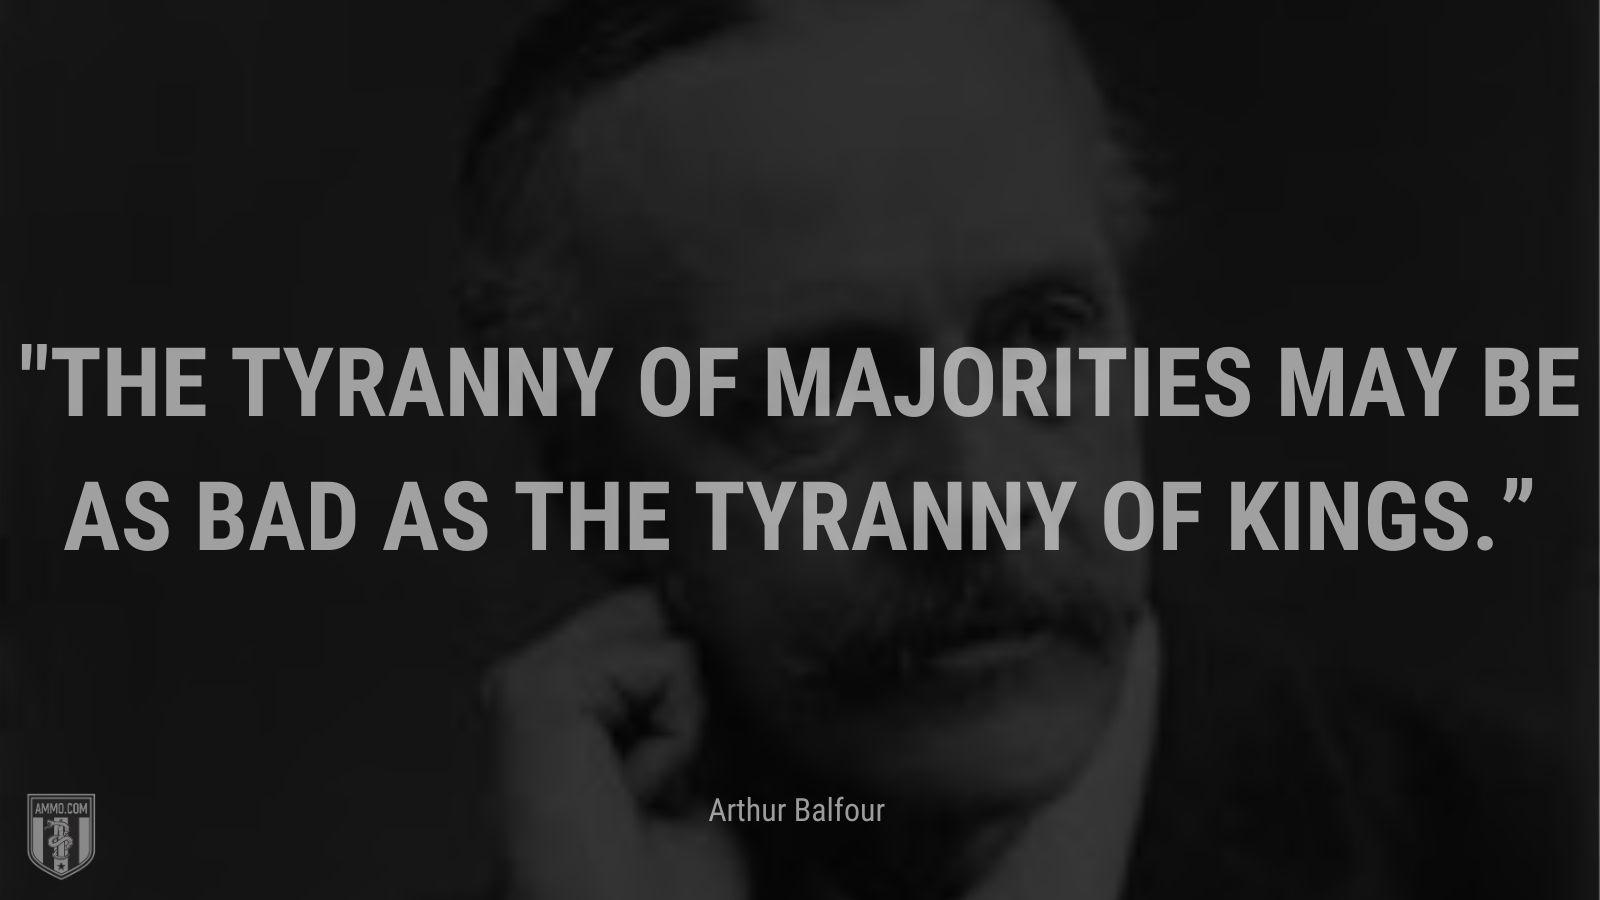 """The tyranny of majorities may be as bad as the tyranny of kings."" - Arthur Balfour"